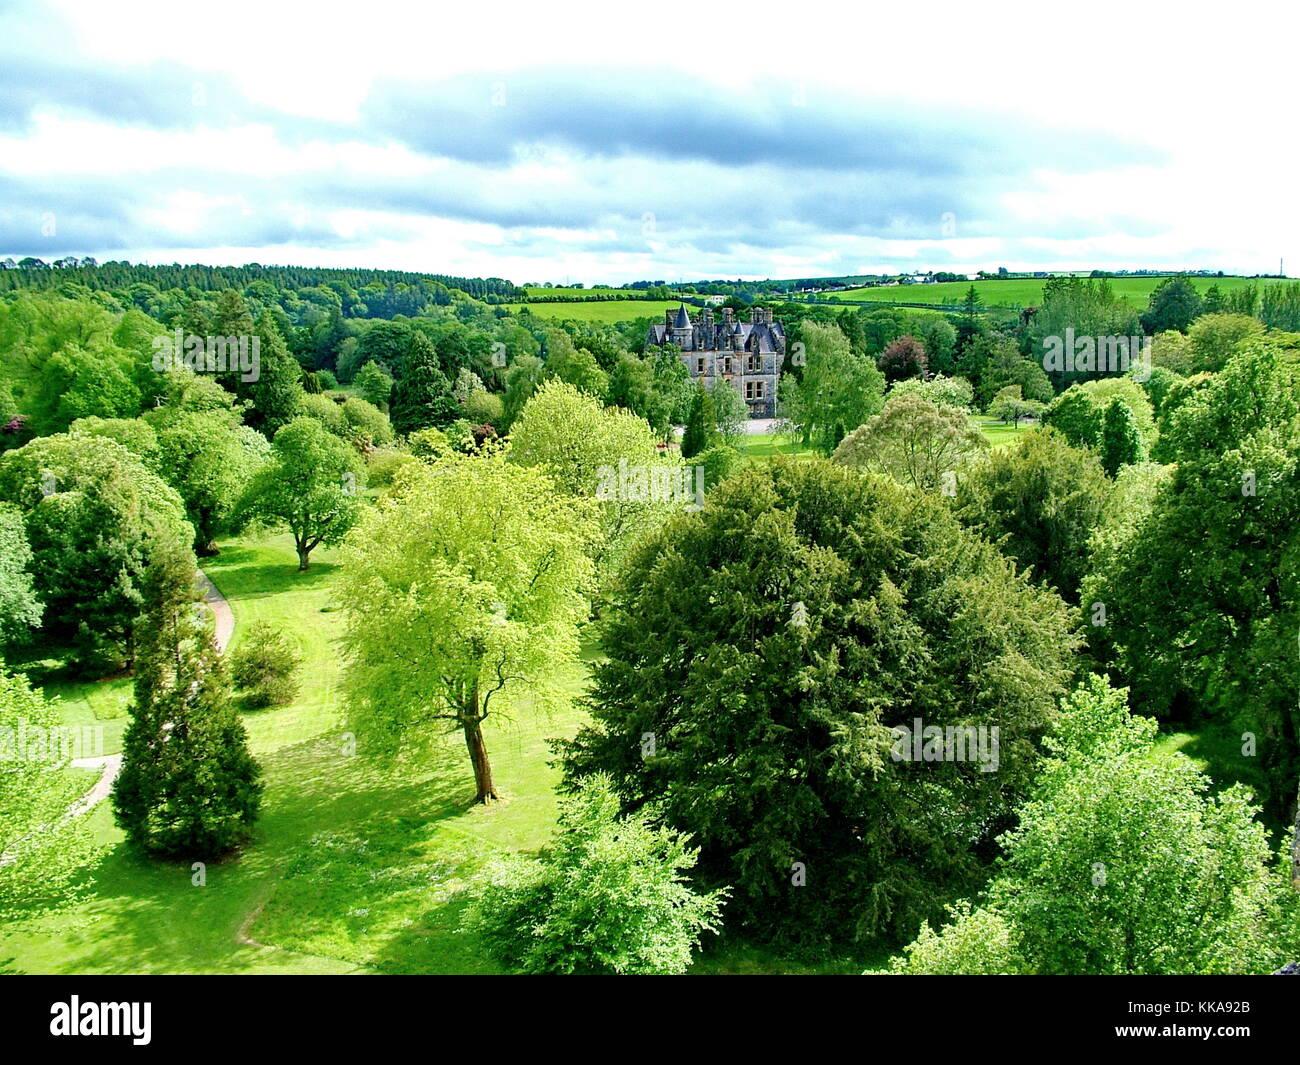 Blarney House near Blarney Castle, Co Cork, Ireland - Stock Image